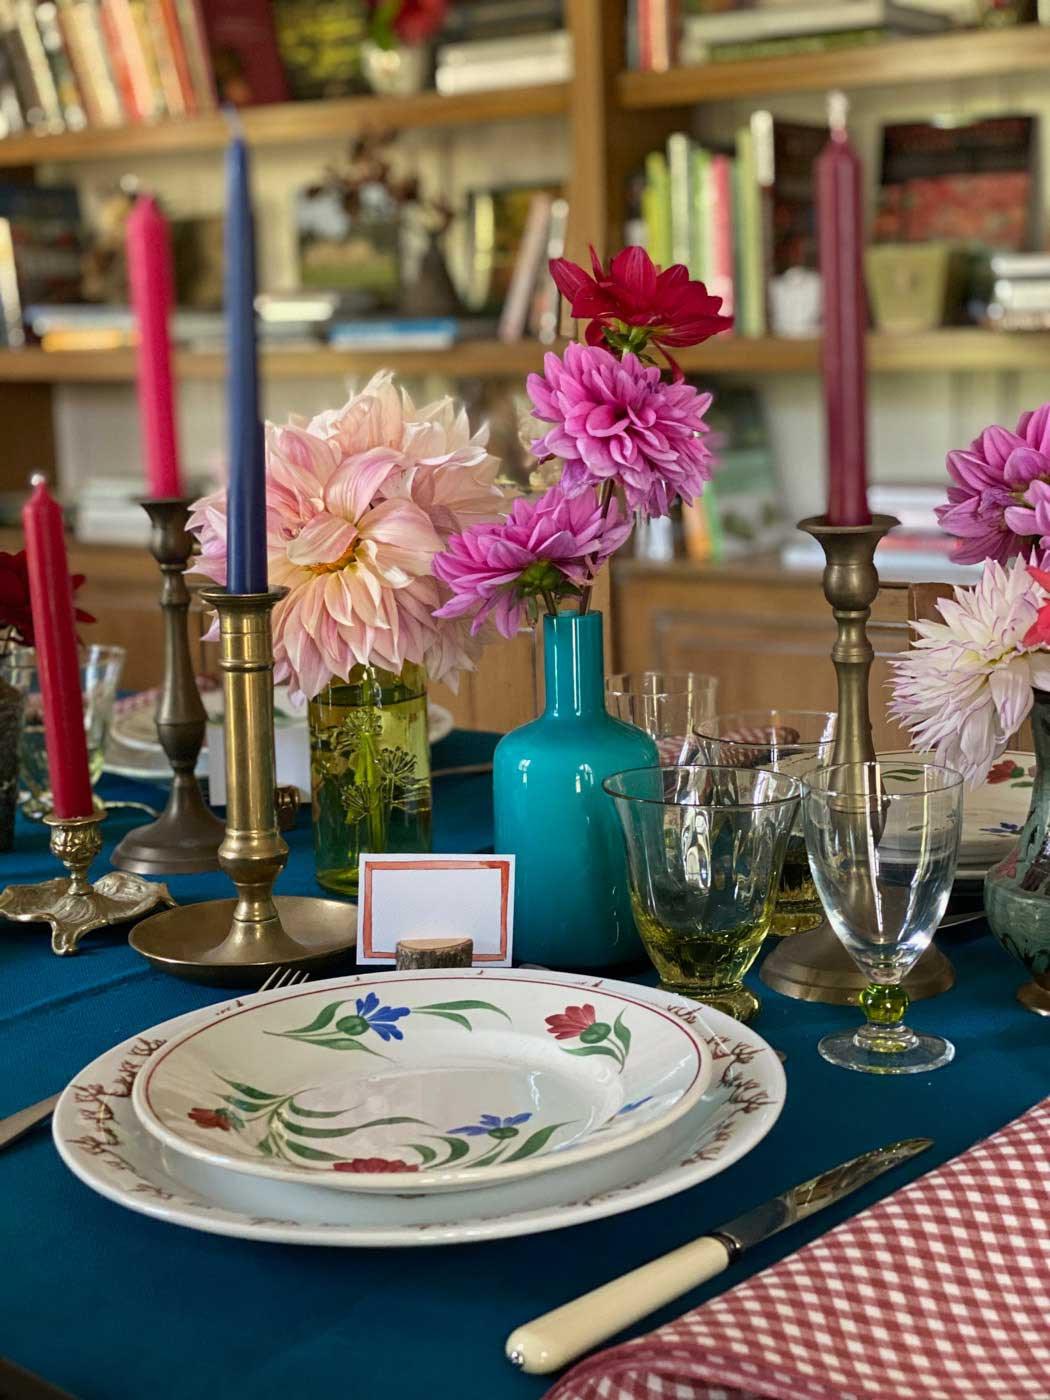 dresser-table-art-dahlias-tablescape-how-to-set-table-vt-03